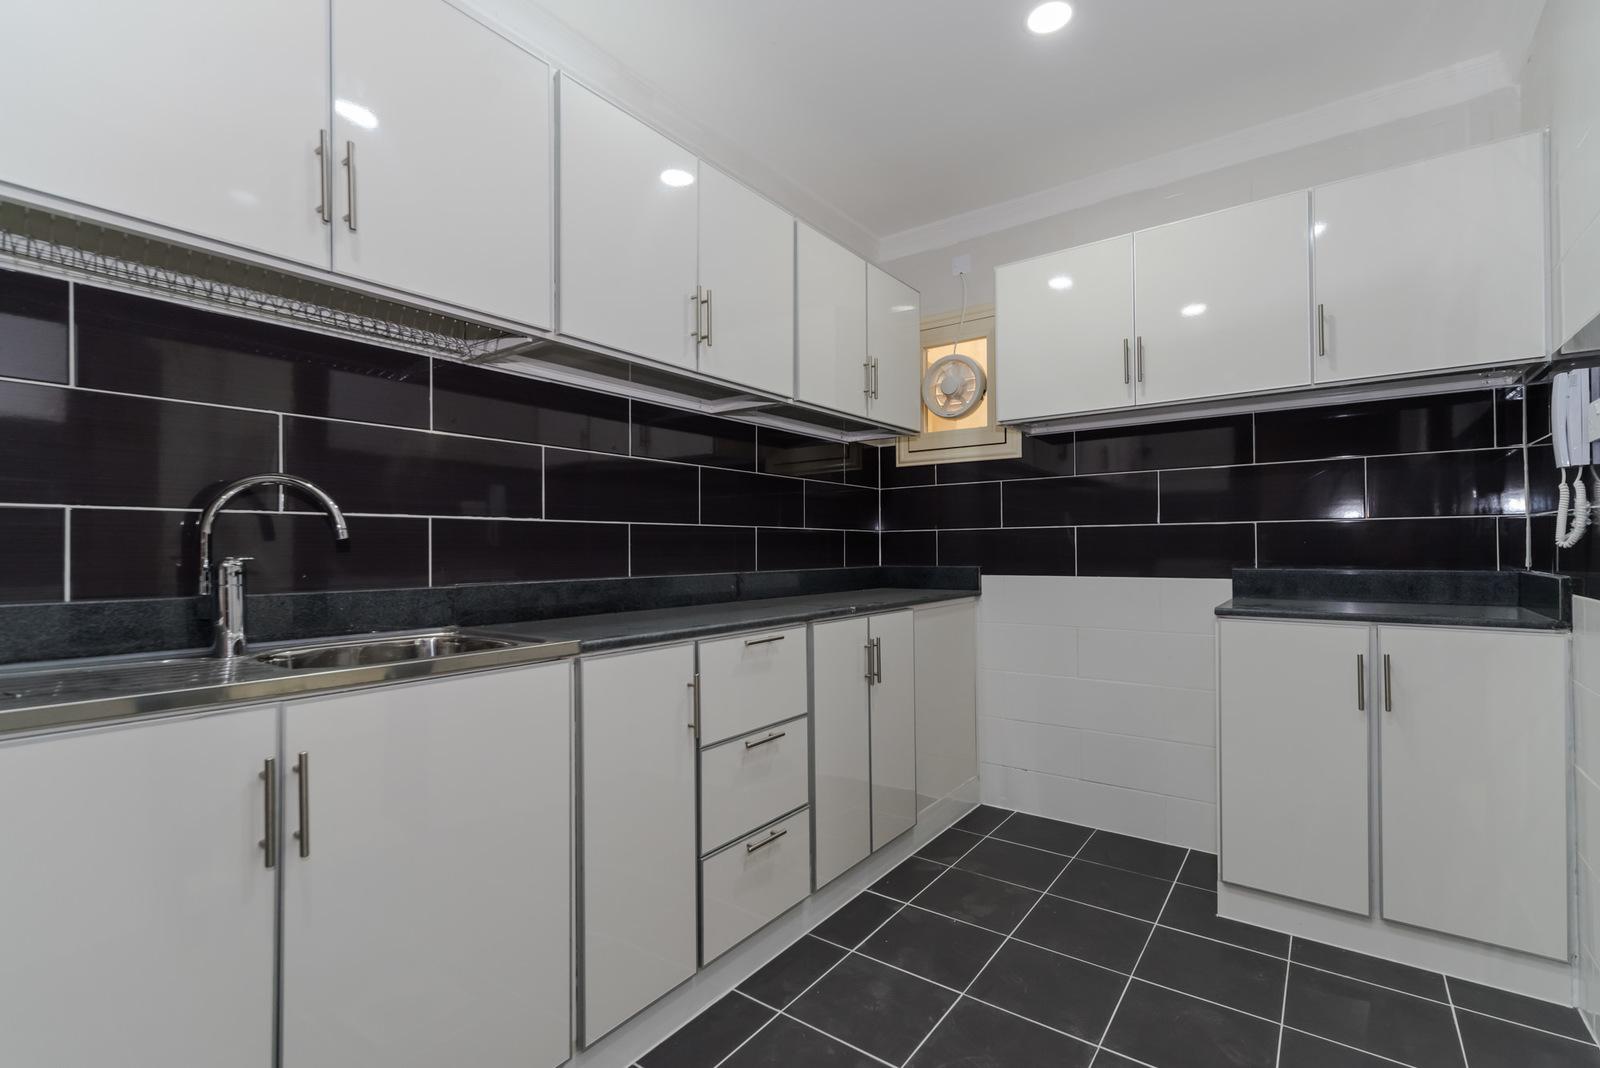 Salwa – New unfurnished, three bedroom apartments